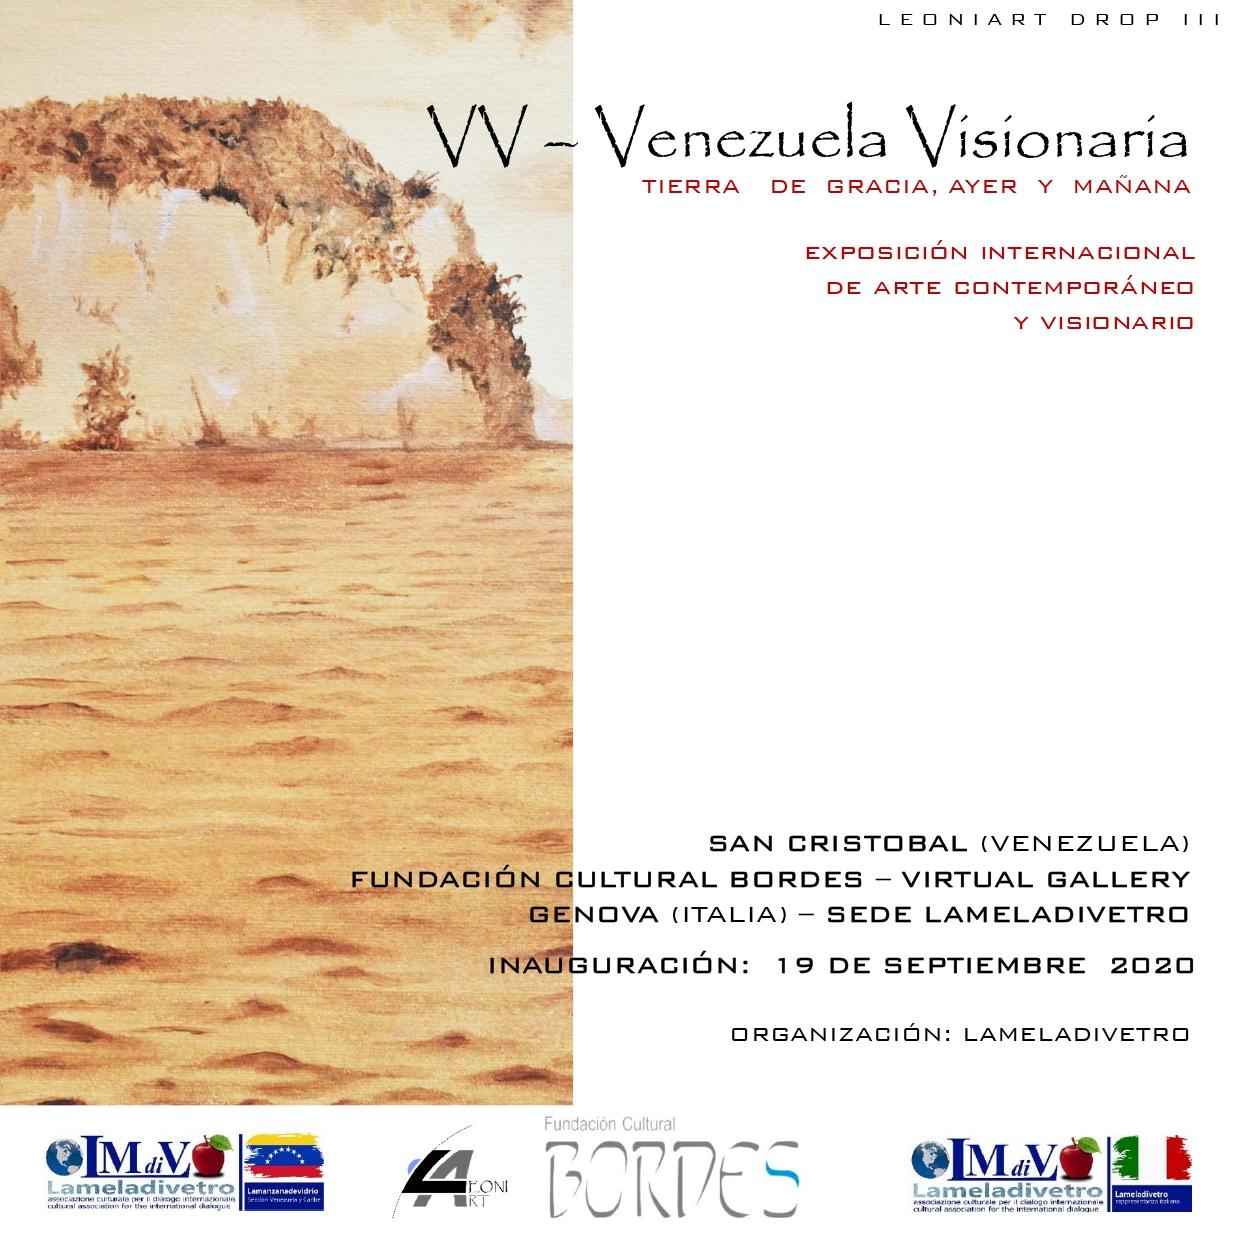 Venezuela Visionaria anuncia artistas seleccionados